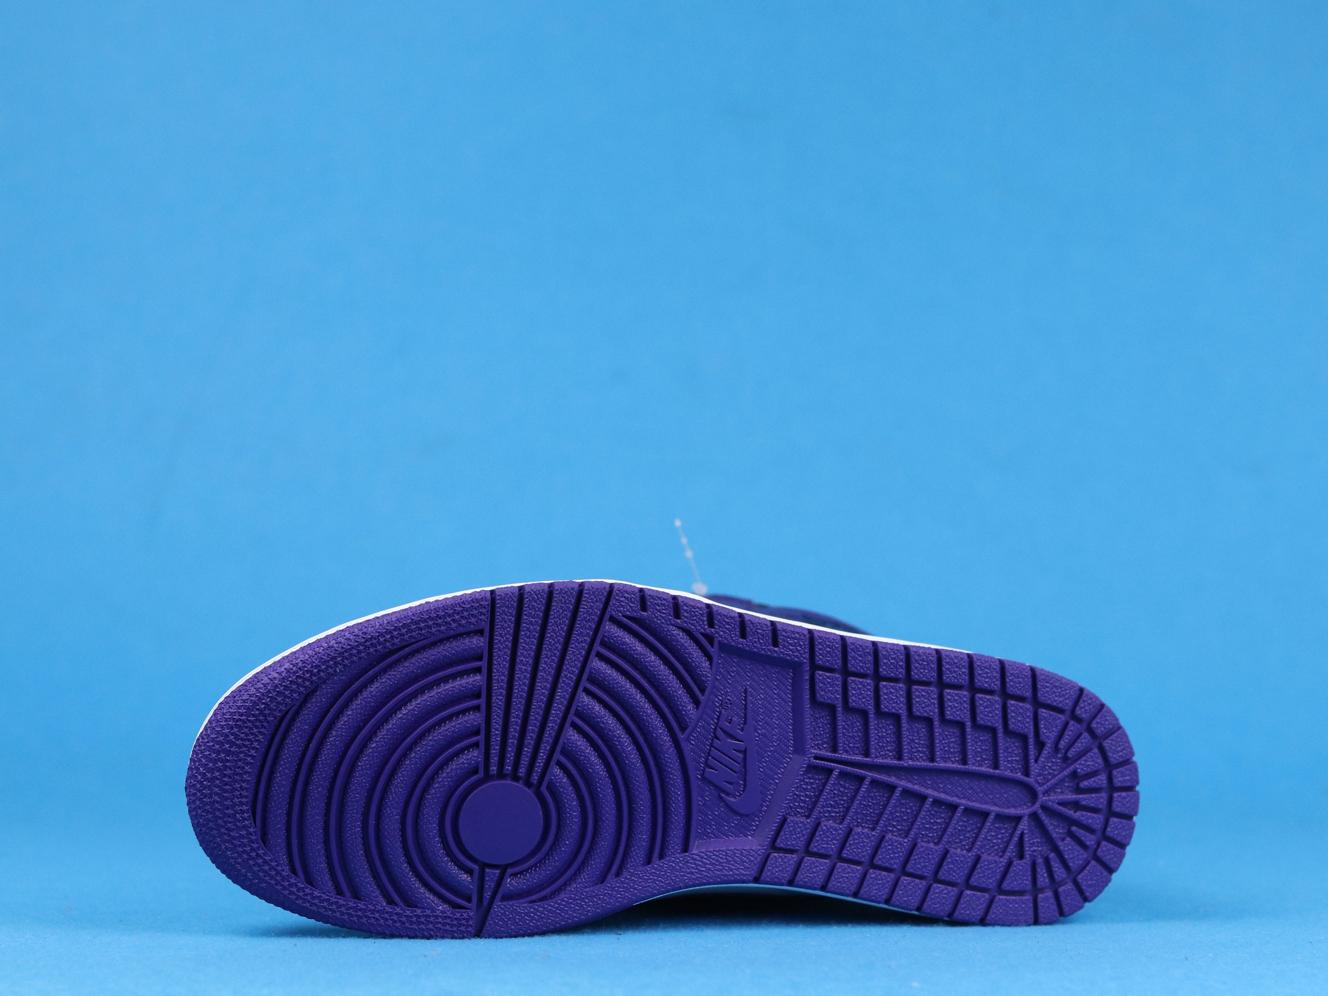 Air Jordan 1 Retro High OG Court Purple 2.0 3